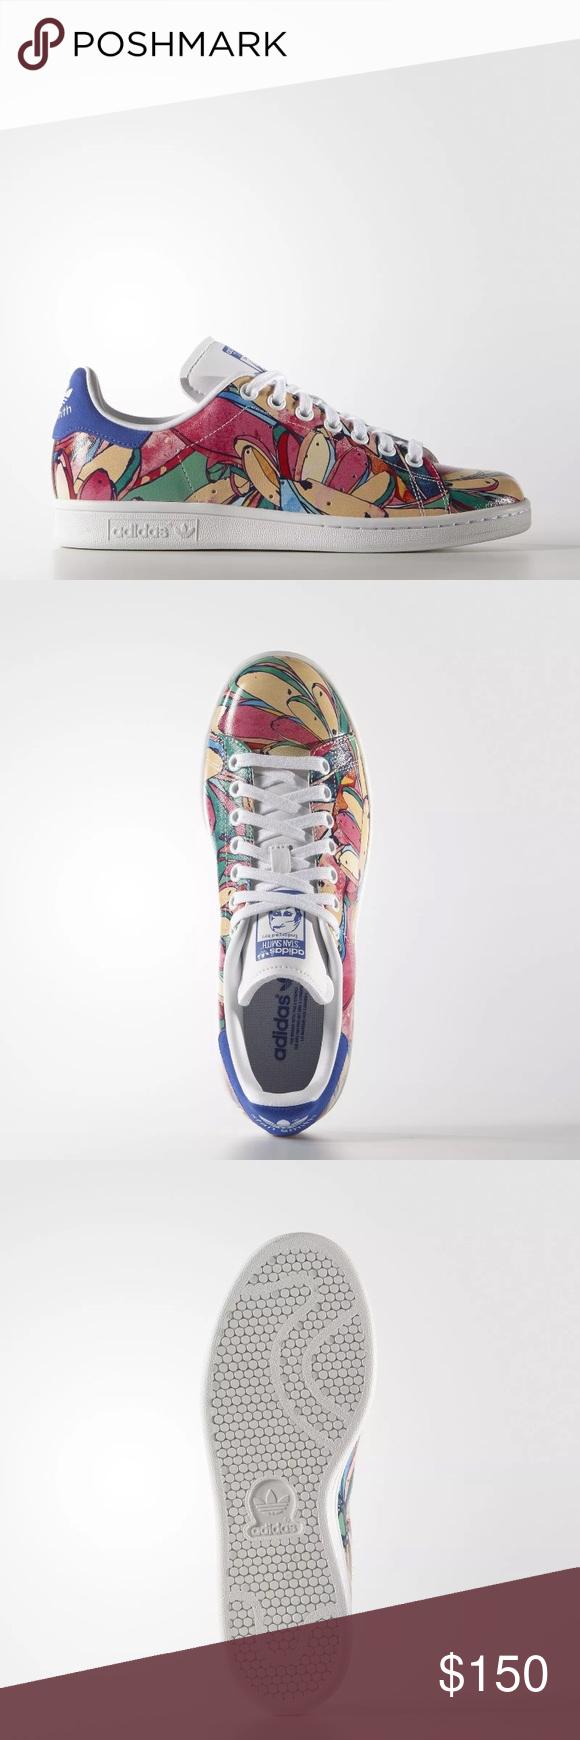 Rabatt Banana Print Adidas Stan Smith Sneakers A collaboration with  im Angebot